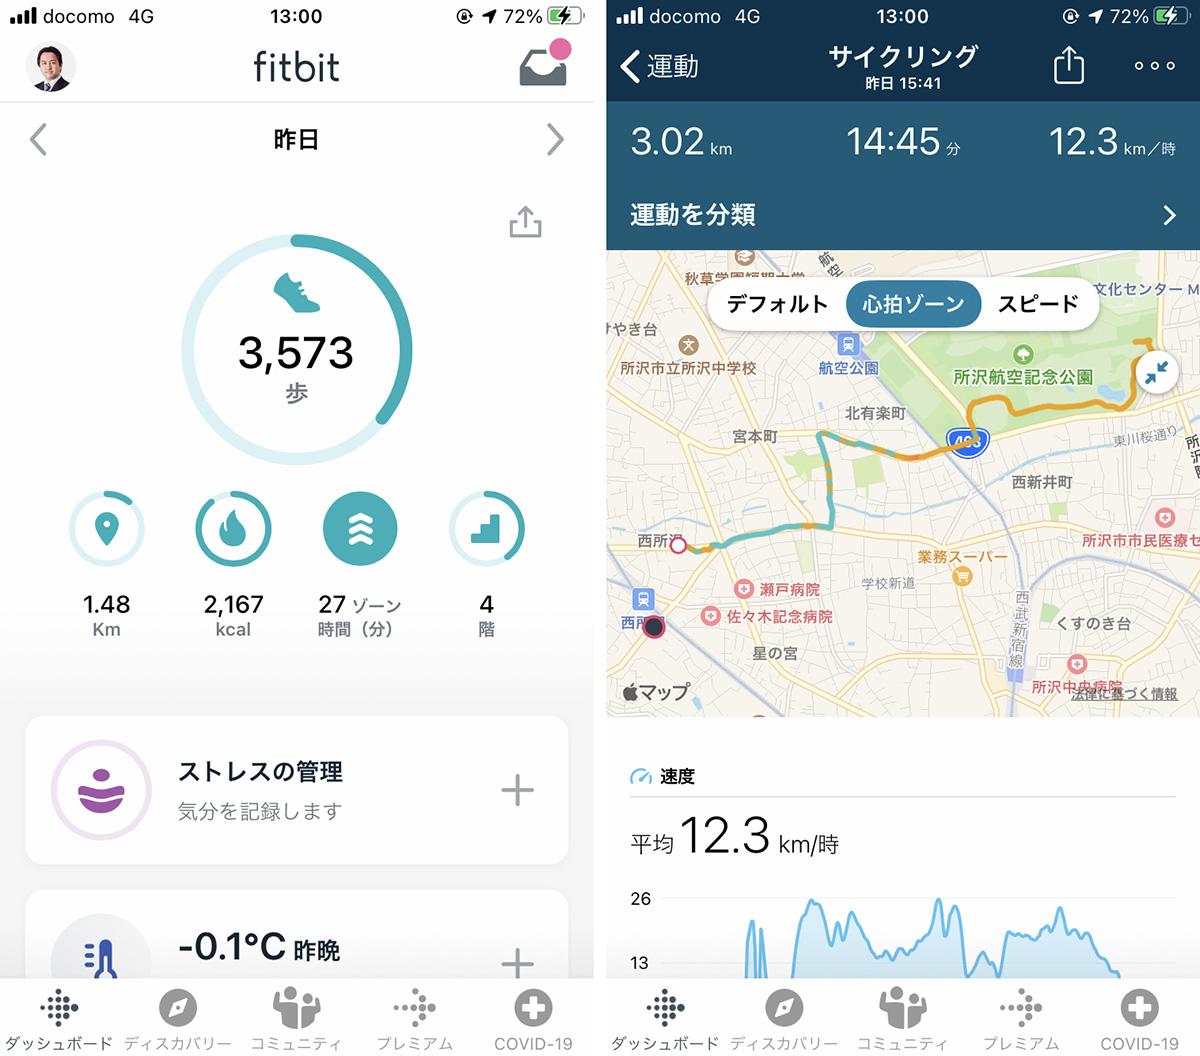 fitbit senseのアプリ画面画像